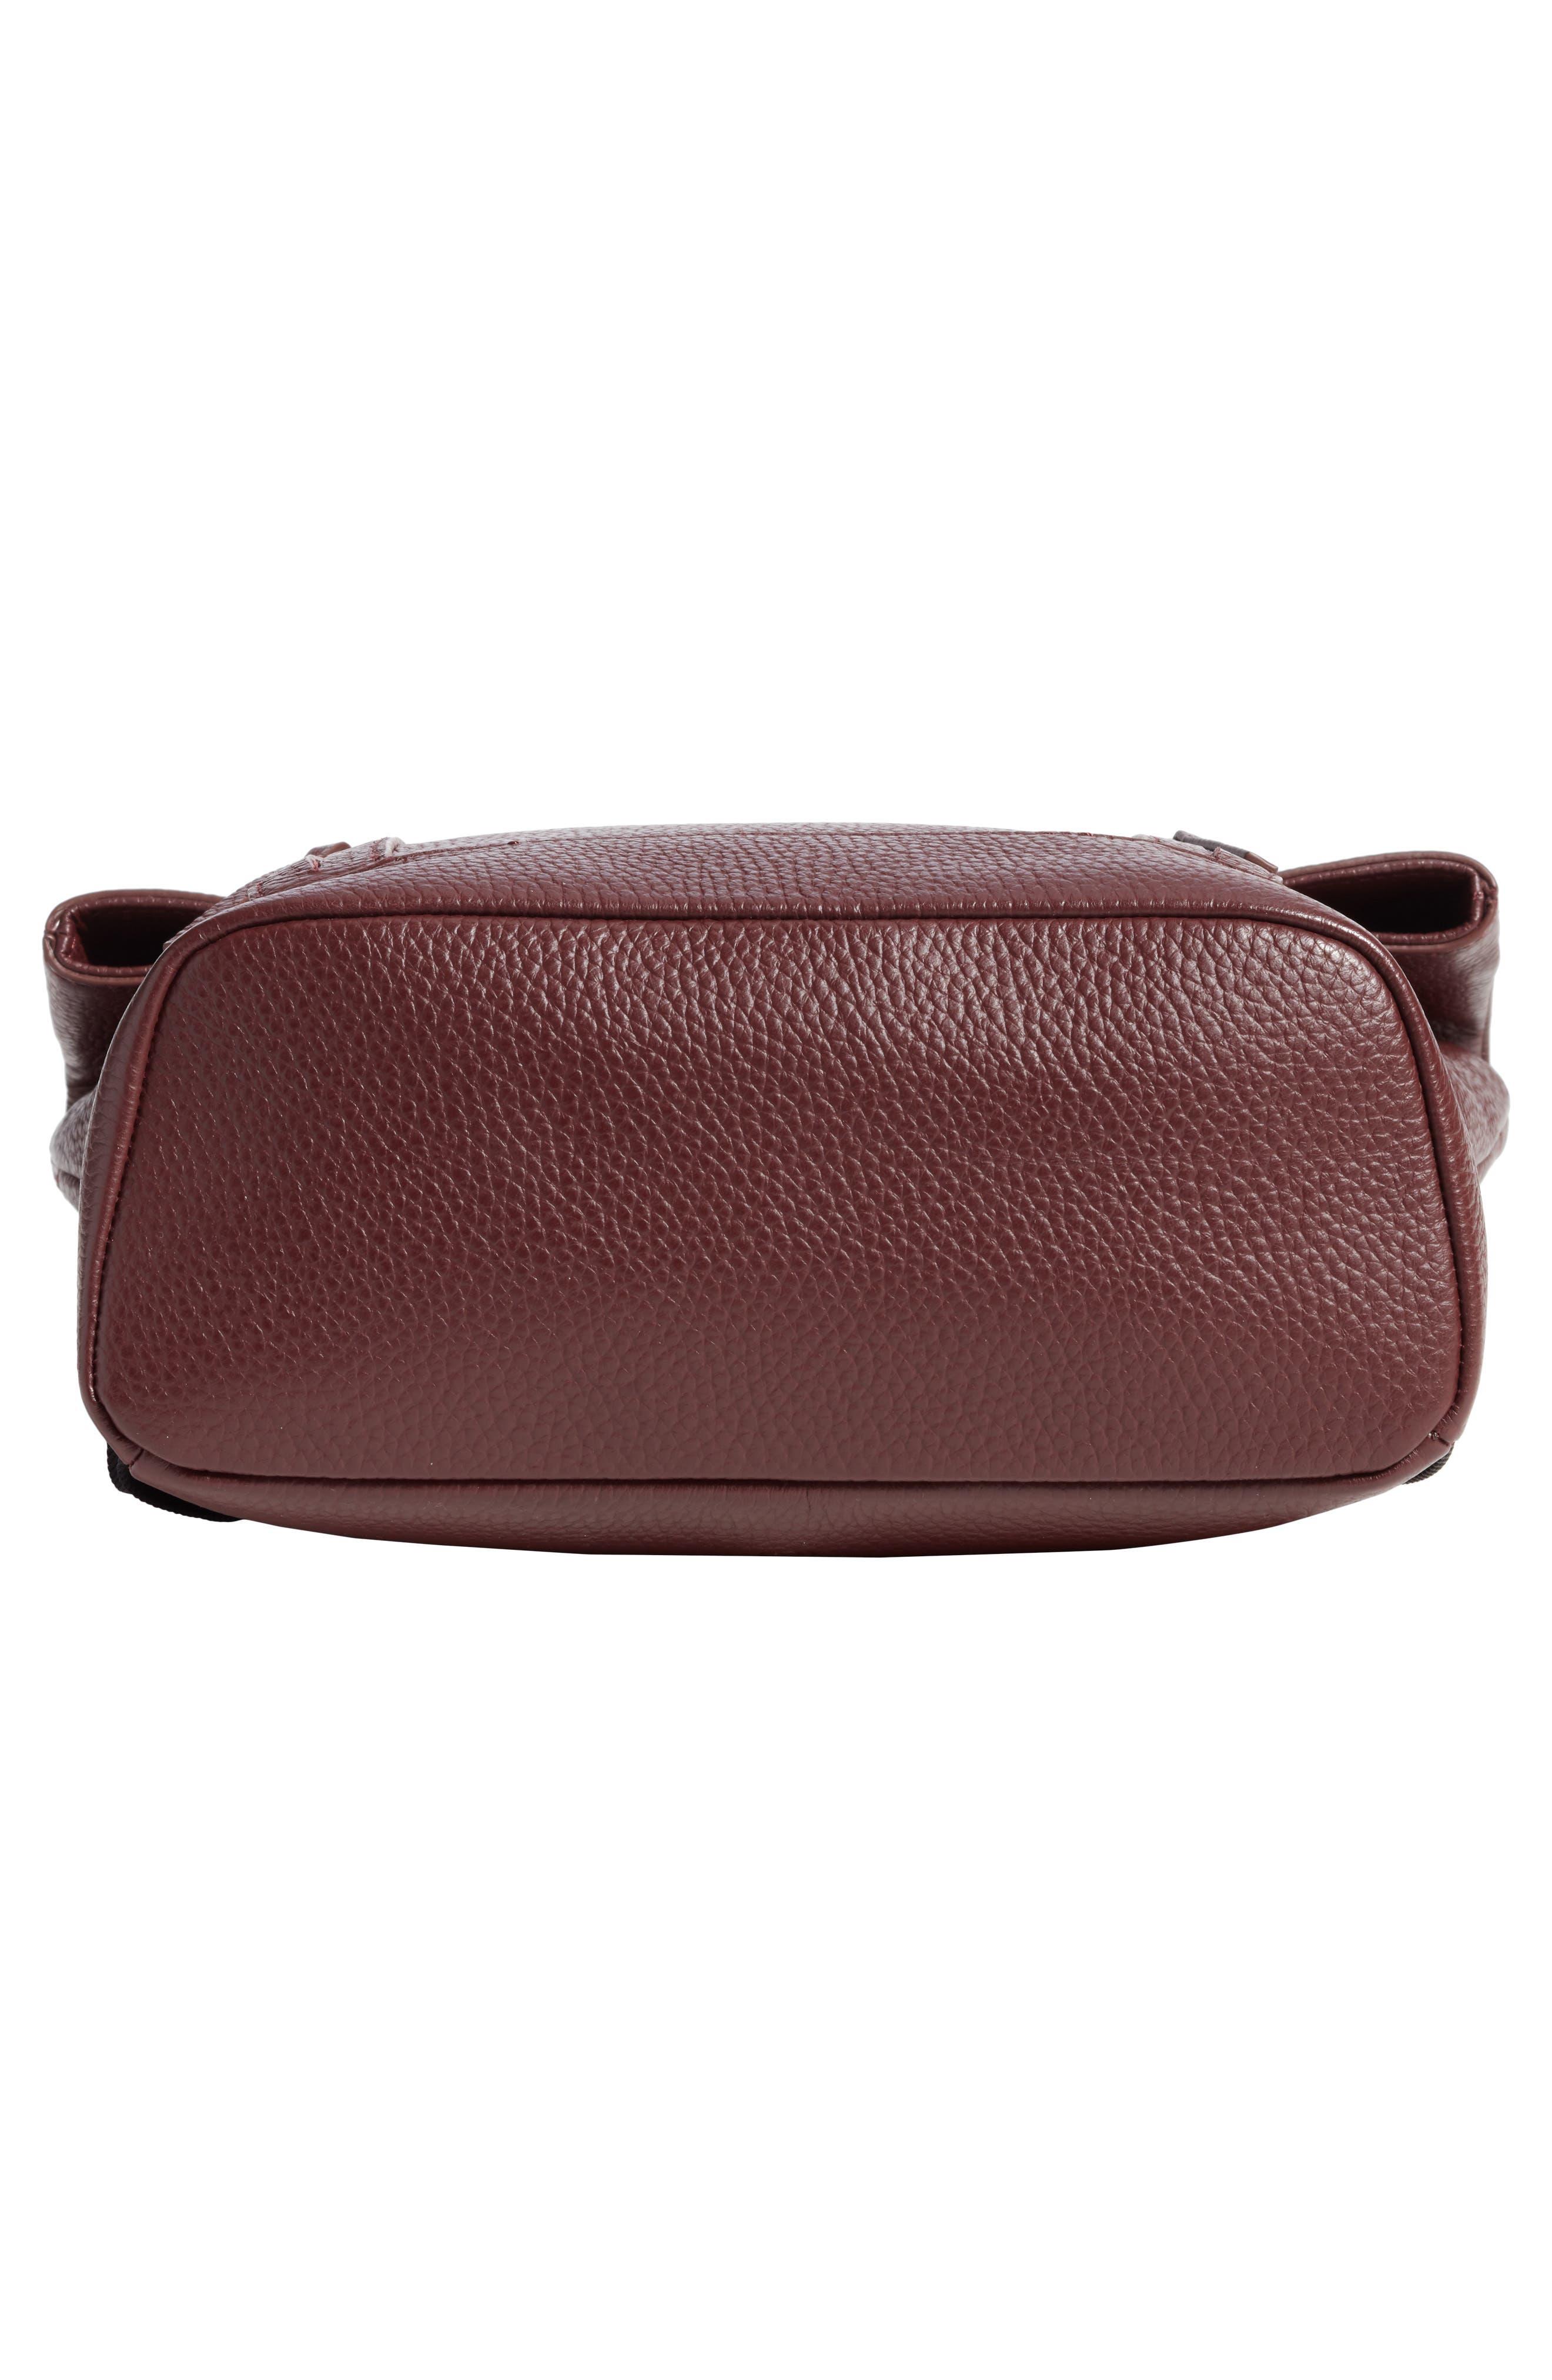 Remy Pebbled Leather Backpack,                             Alternate thumbnail 6, color,                             BURGUNDY FIG